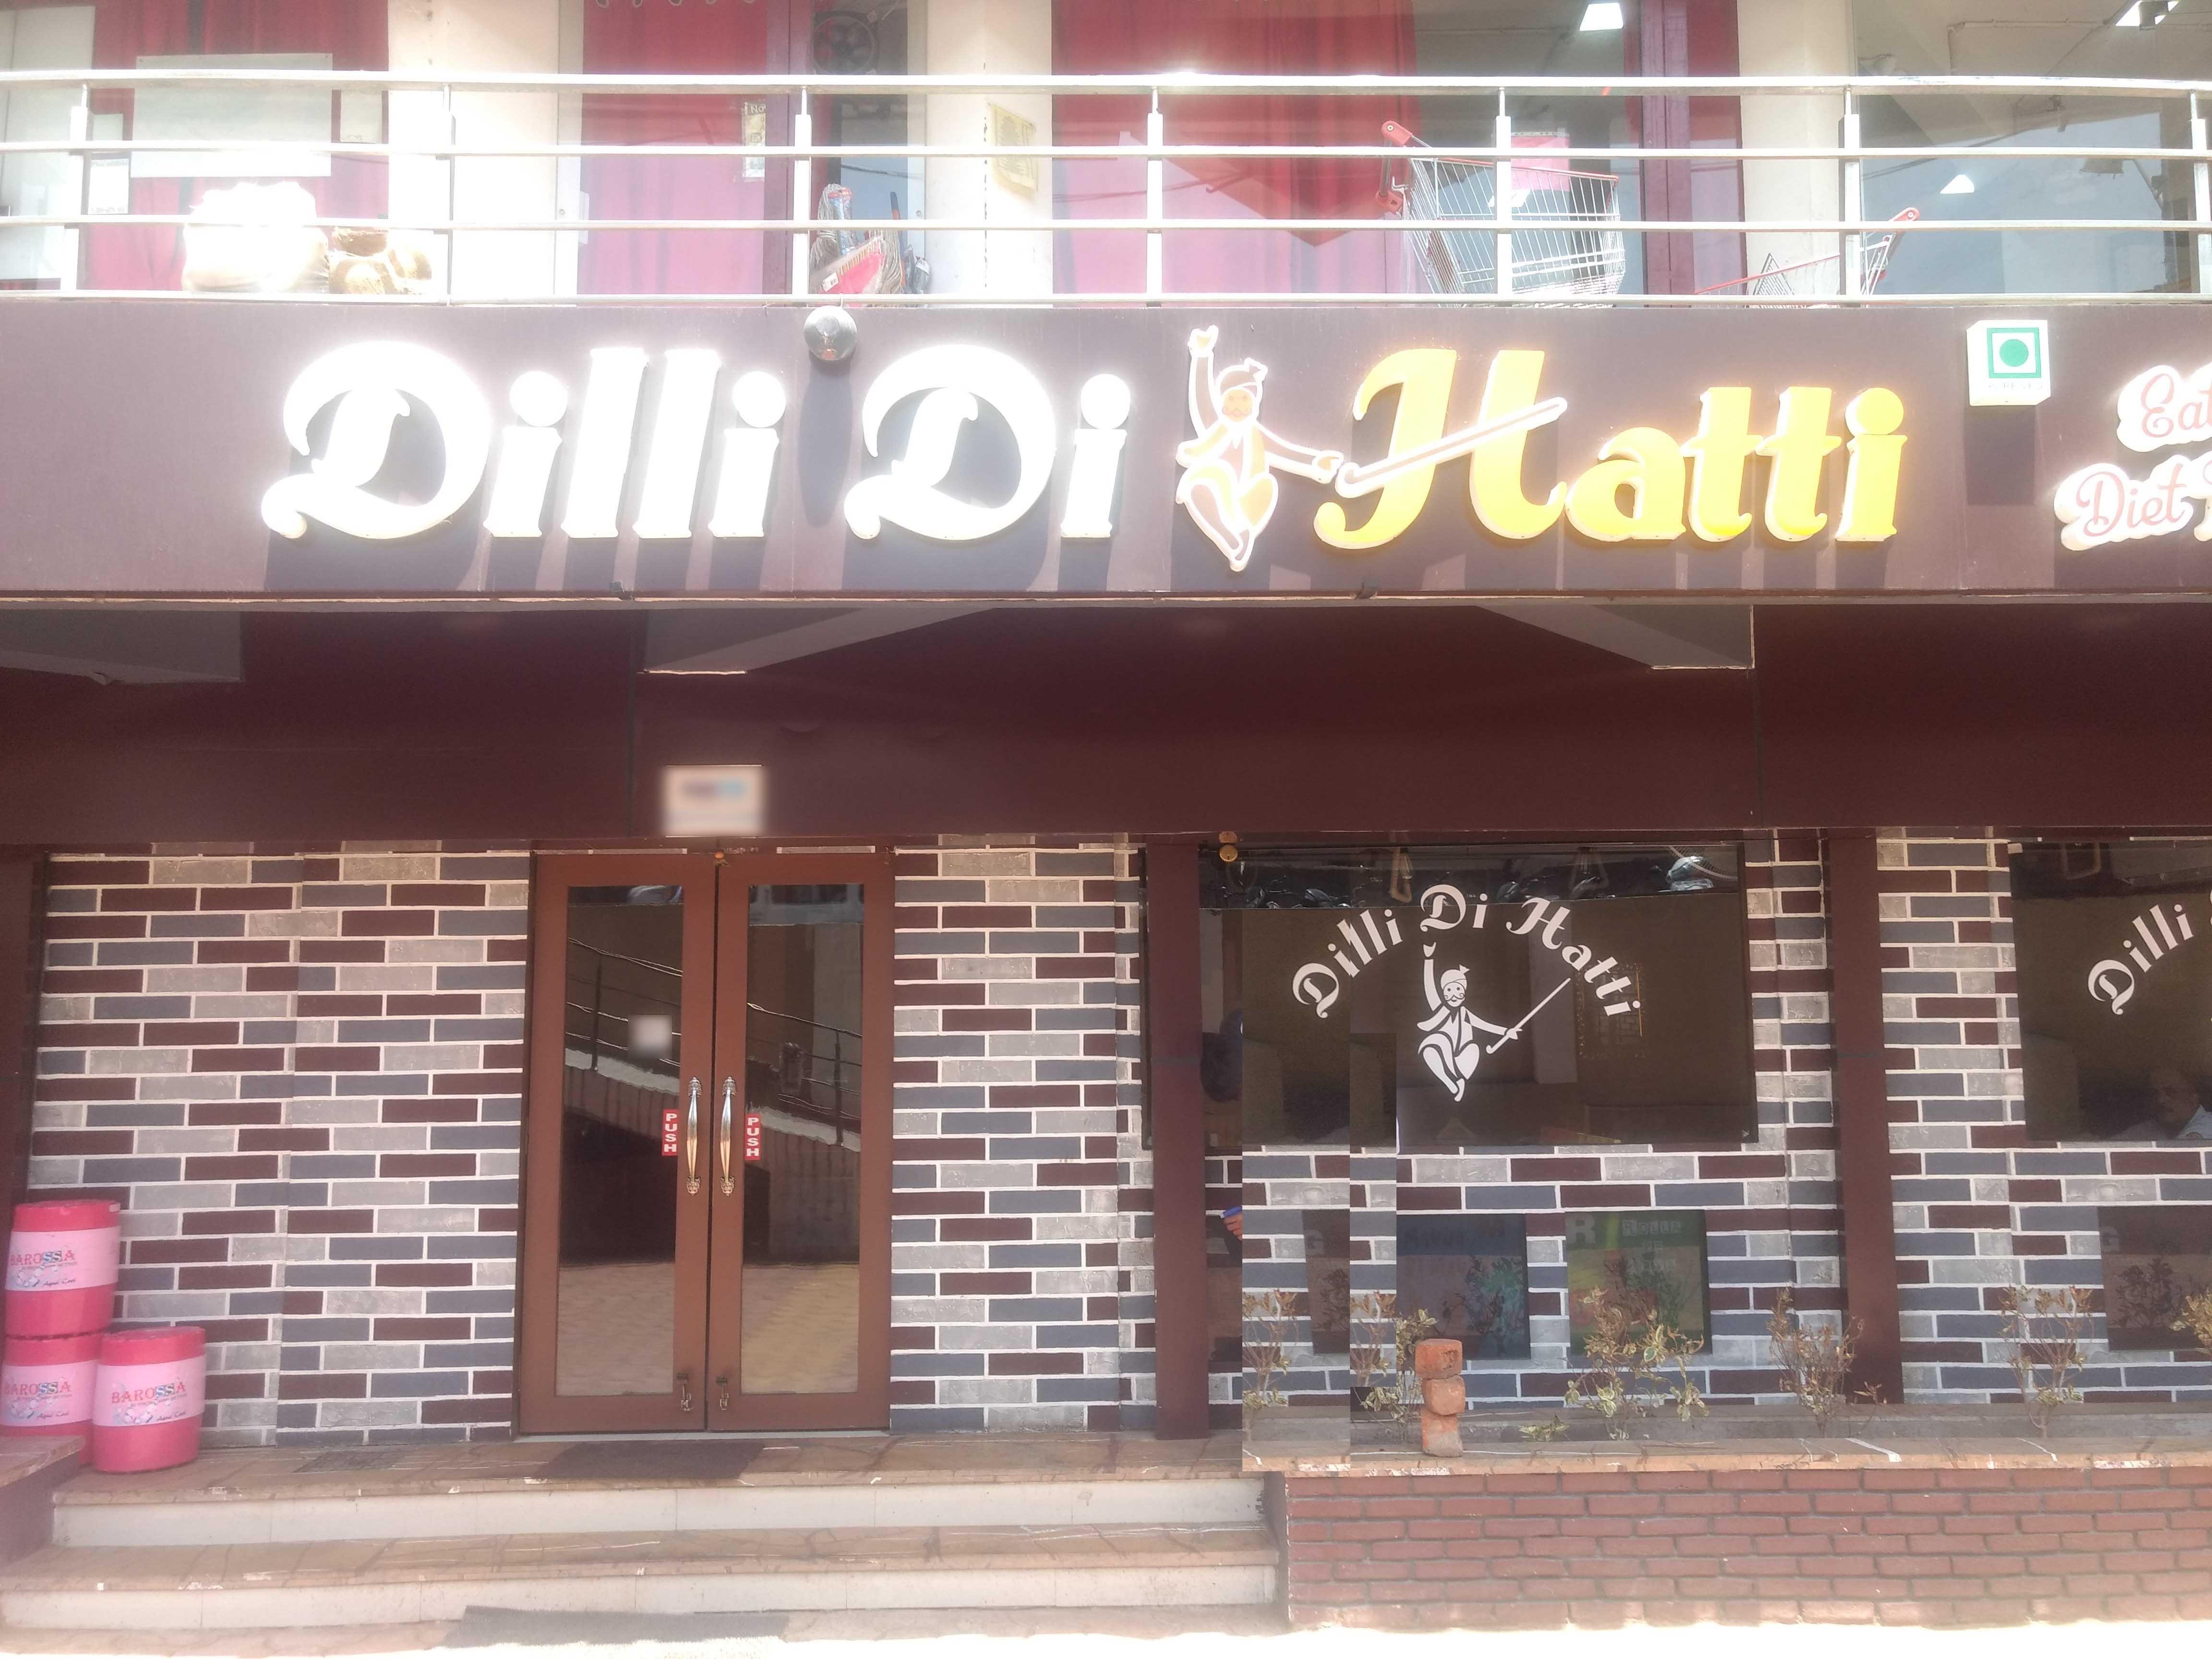 Dilli Di Hatti - Kohefiza - Bhopal Image